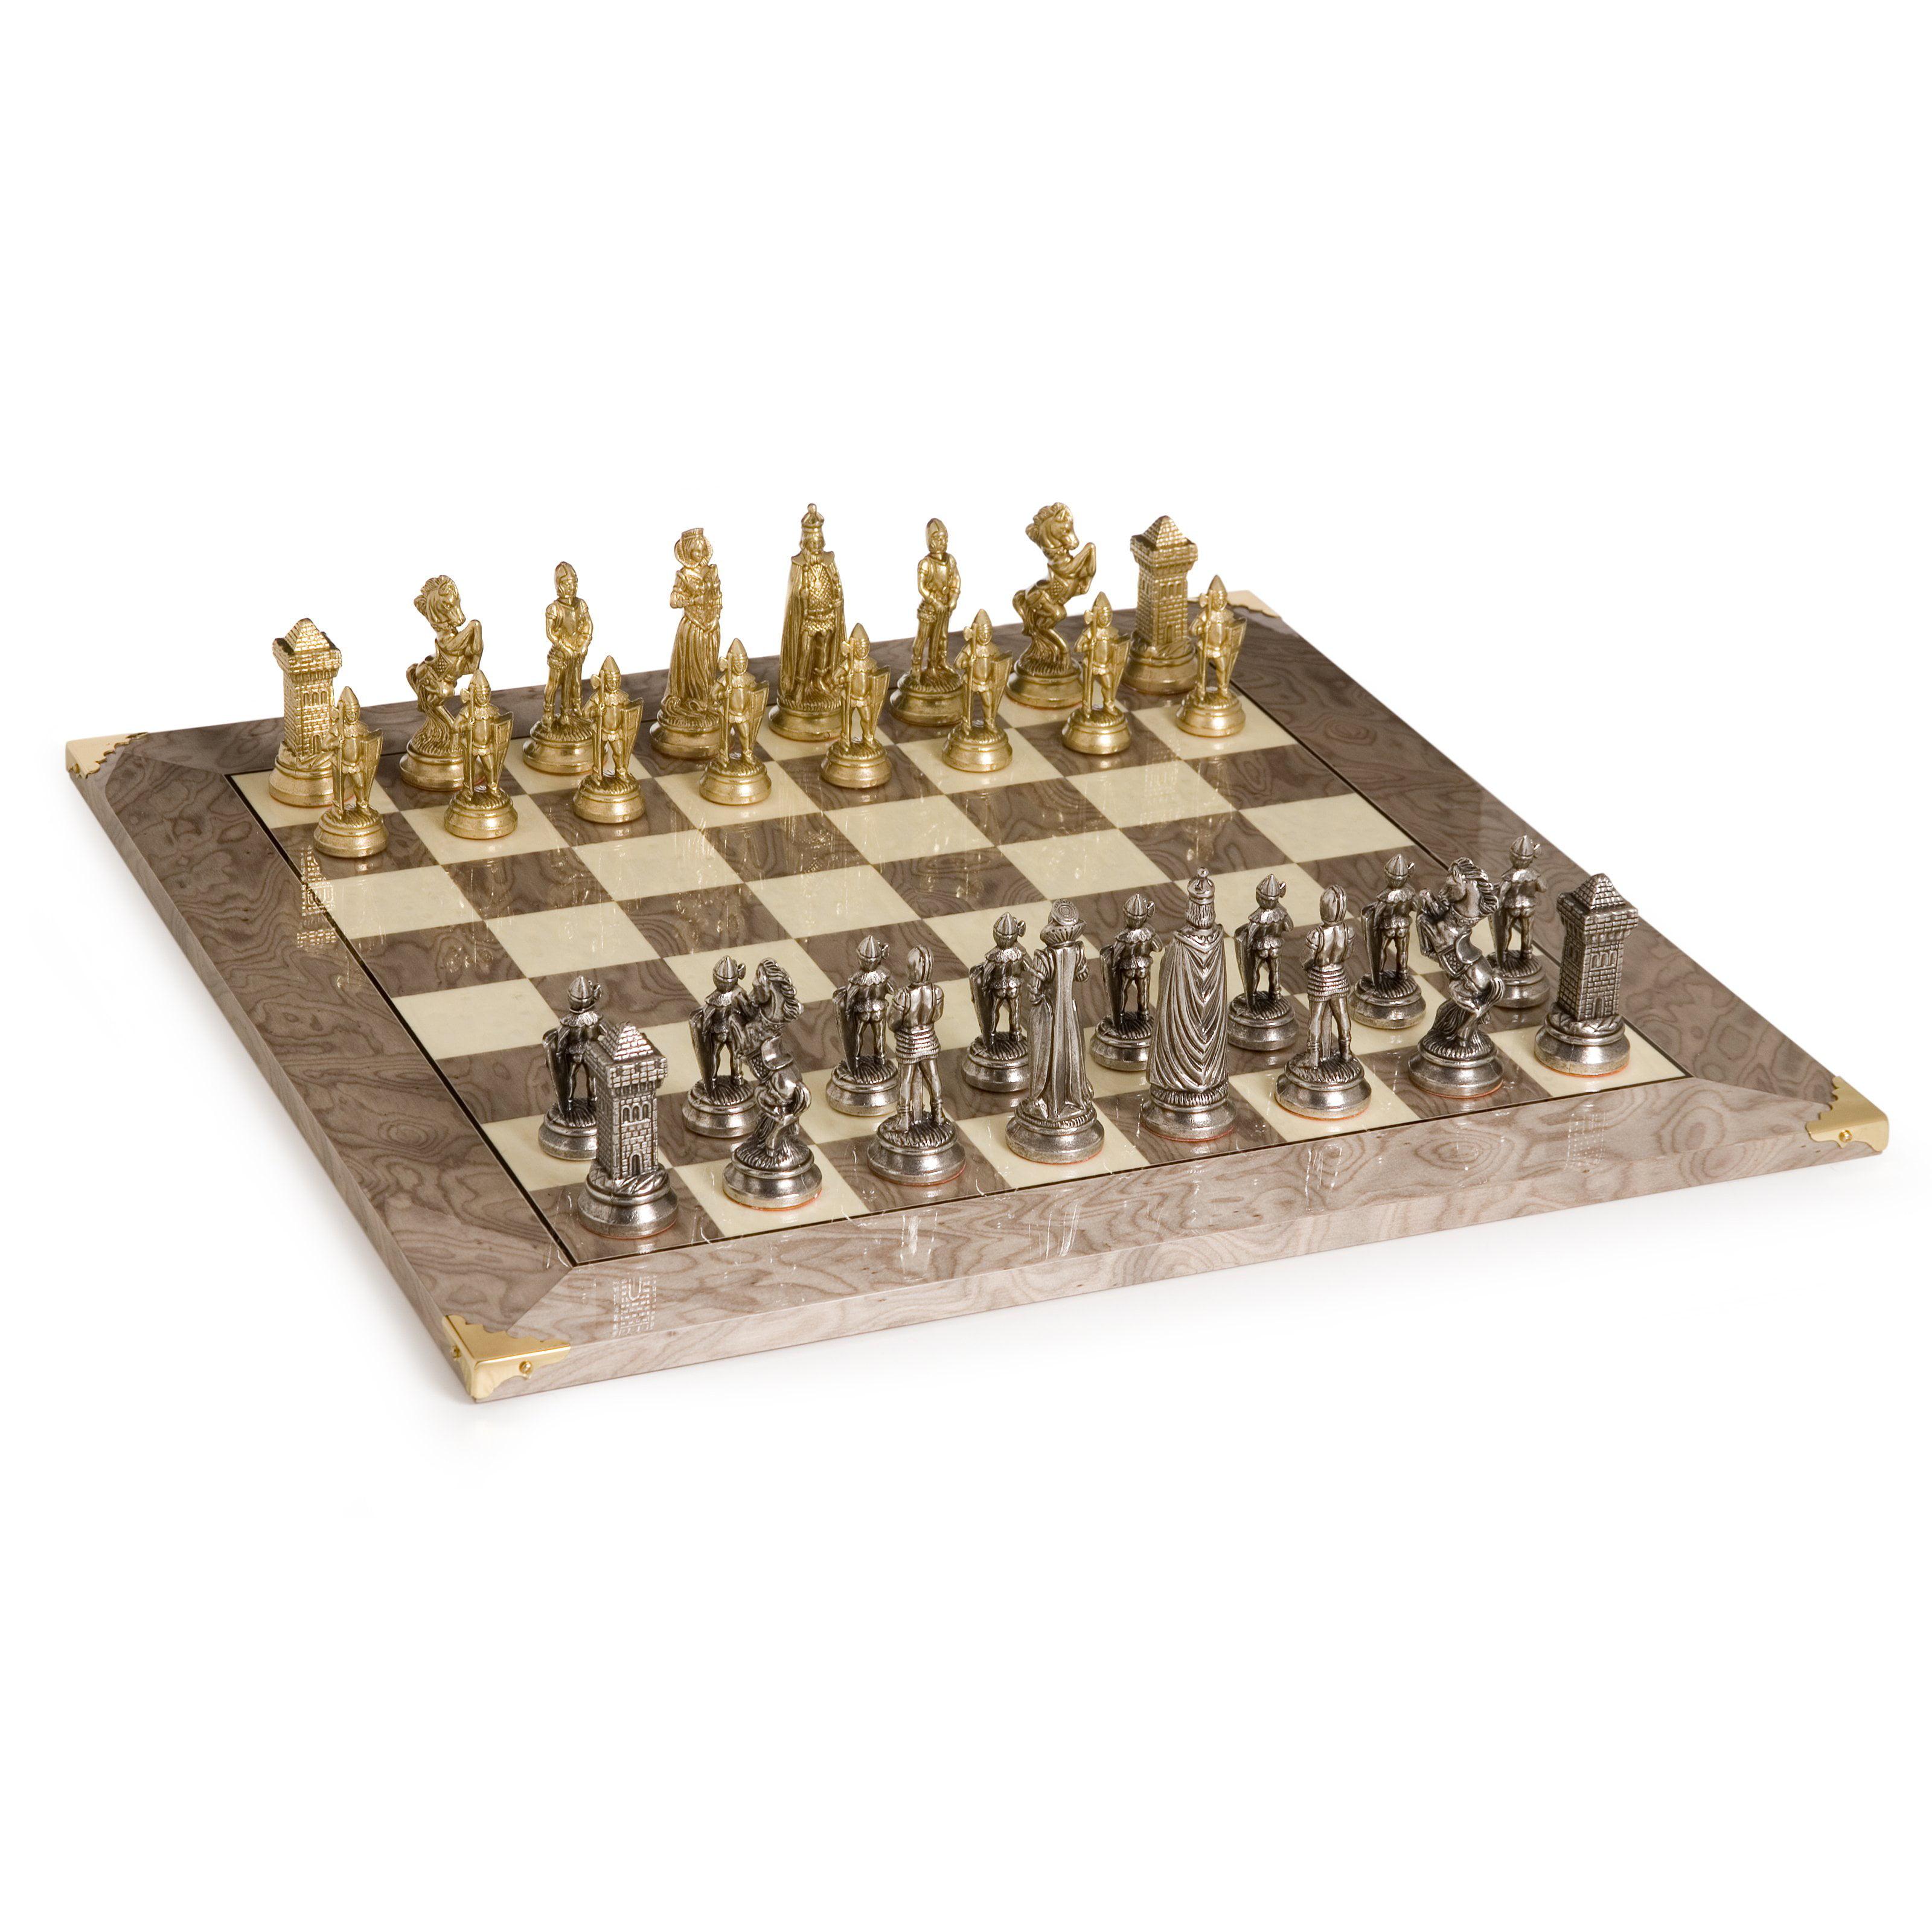 Victorian Brass & Silver Chess Set